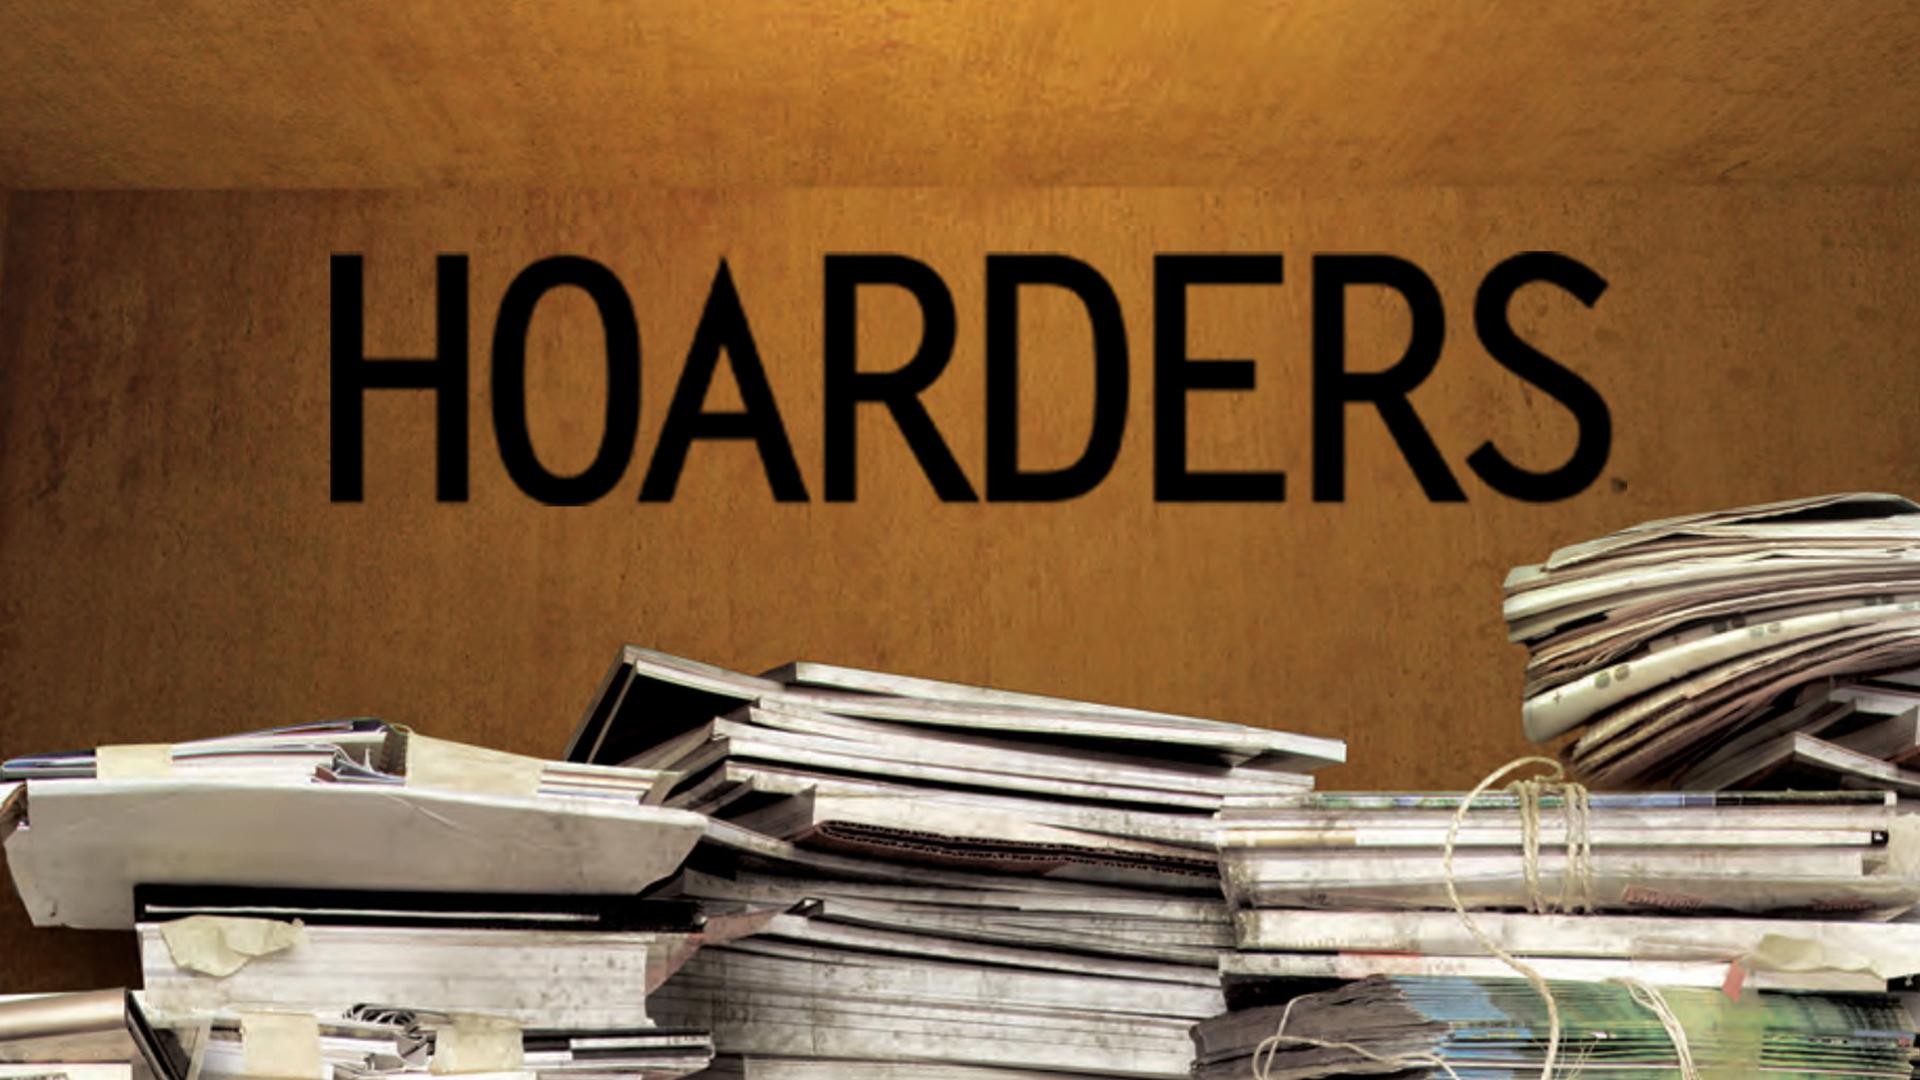 hoarders tv show